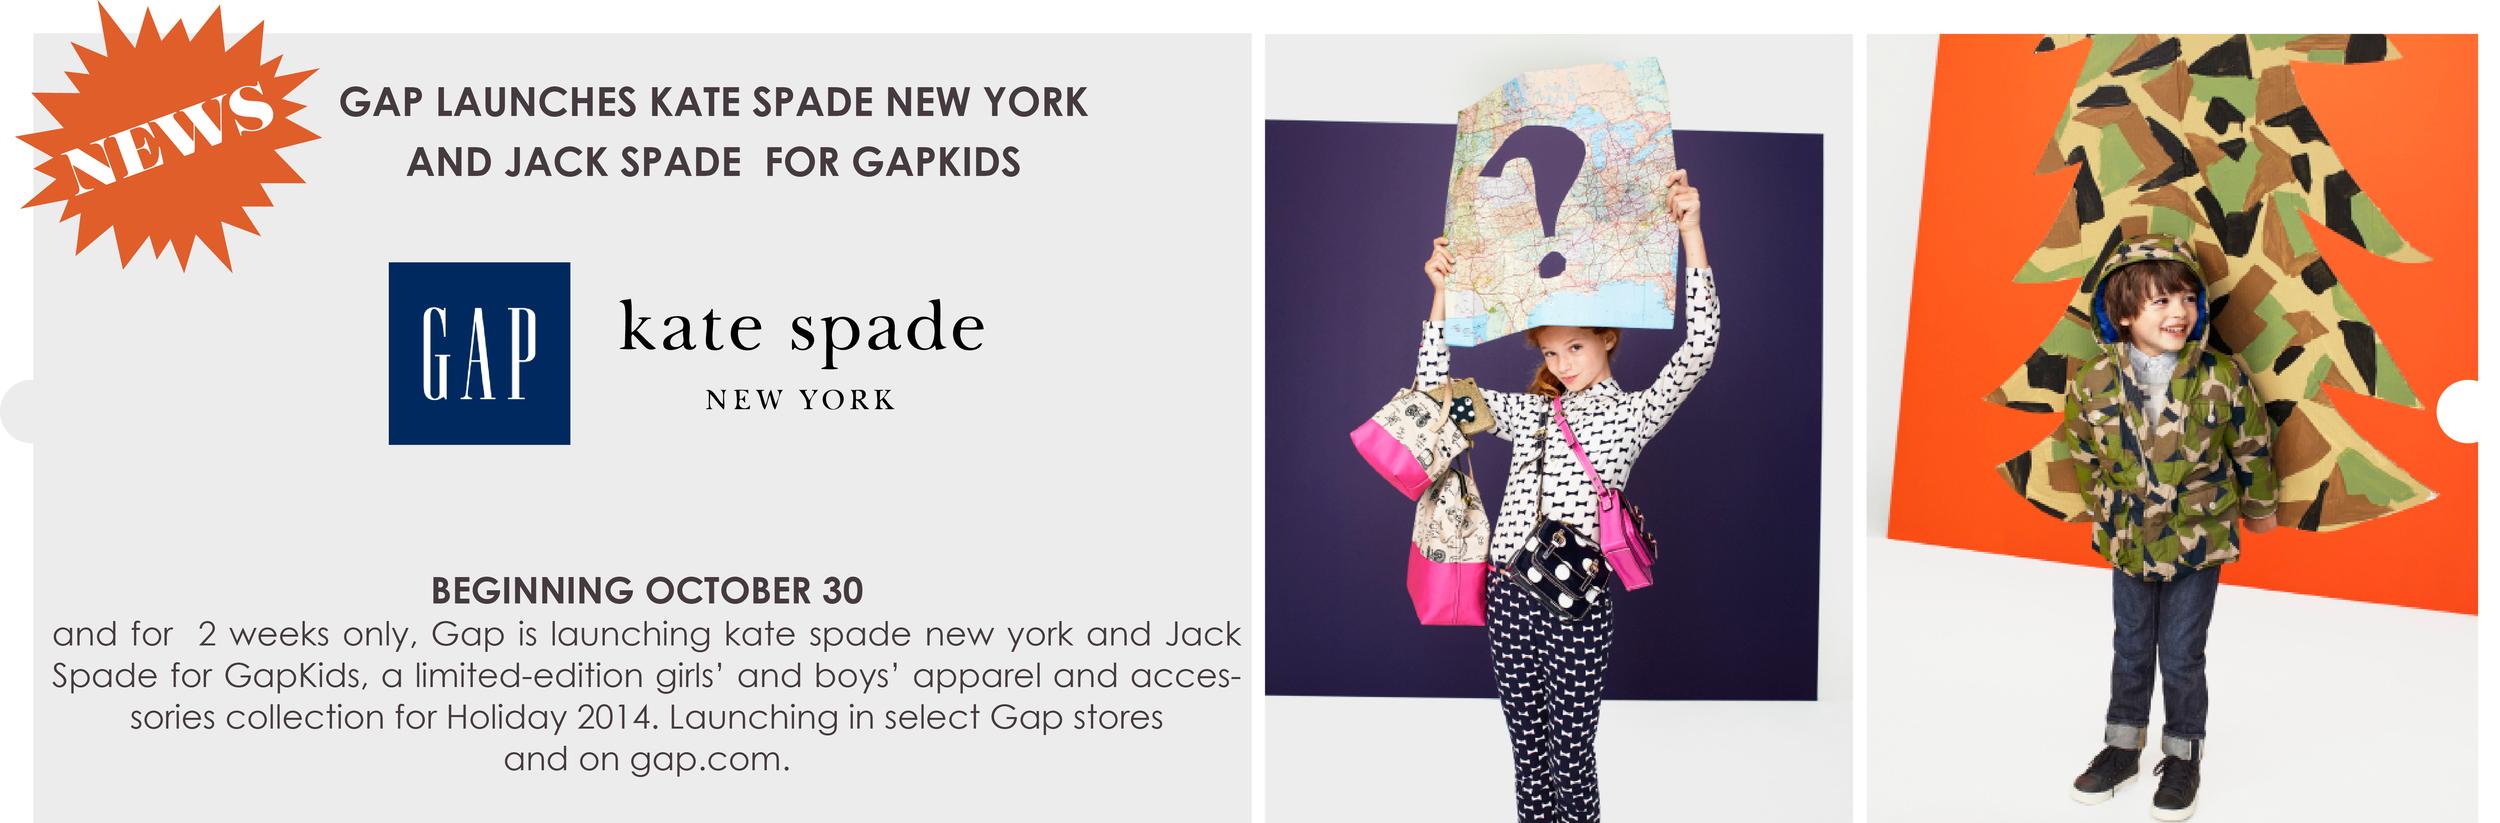 Les_NominettesNews Kate Spade Gap.jpg